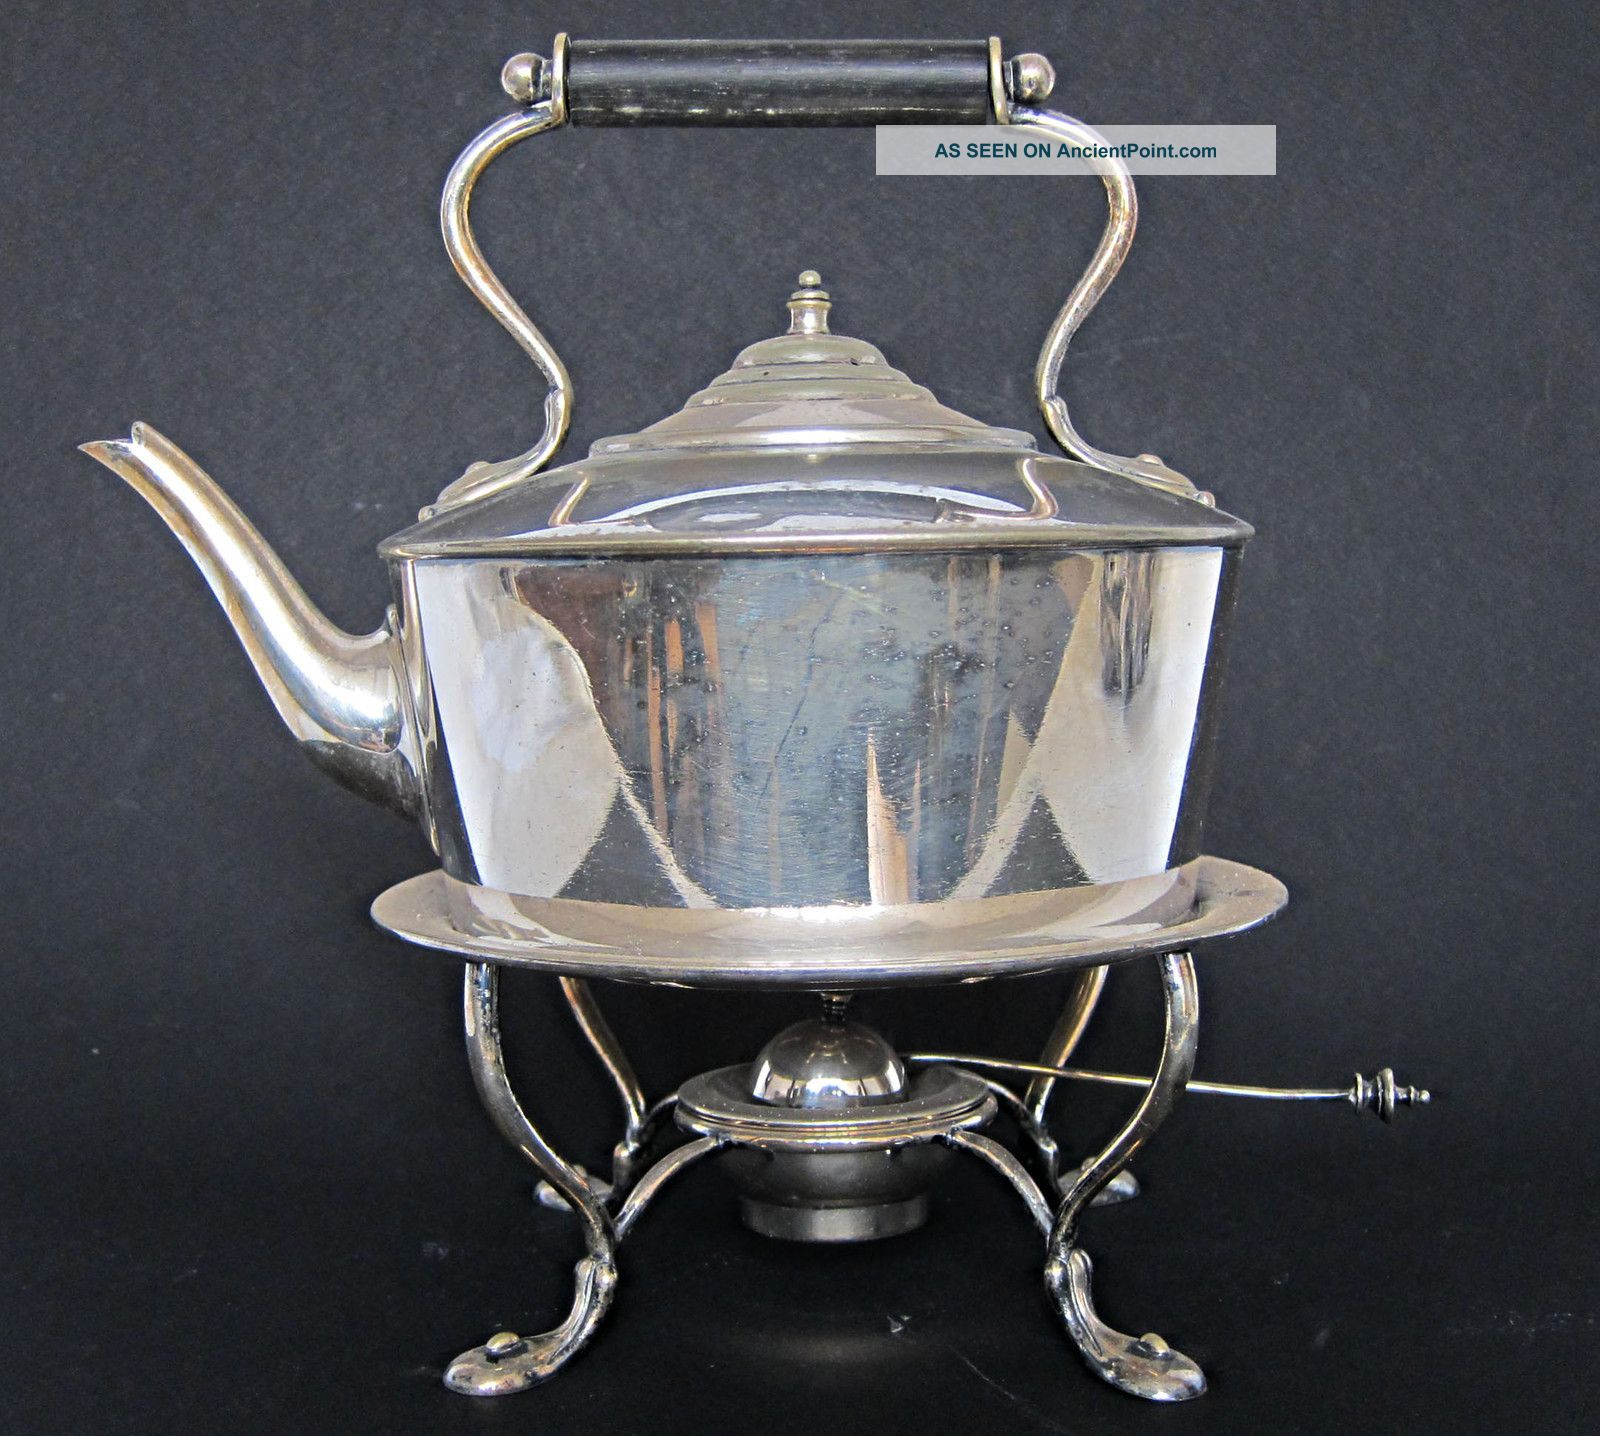 Victorian Antique Art Nouveau Silver Plated Spirit Kettle On Stand Glasgow 1900 Tea/Coffee Pots & Sets photo